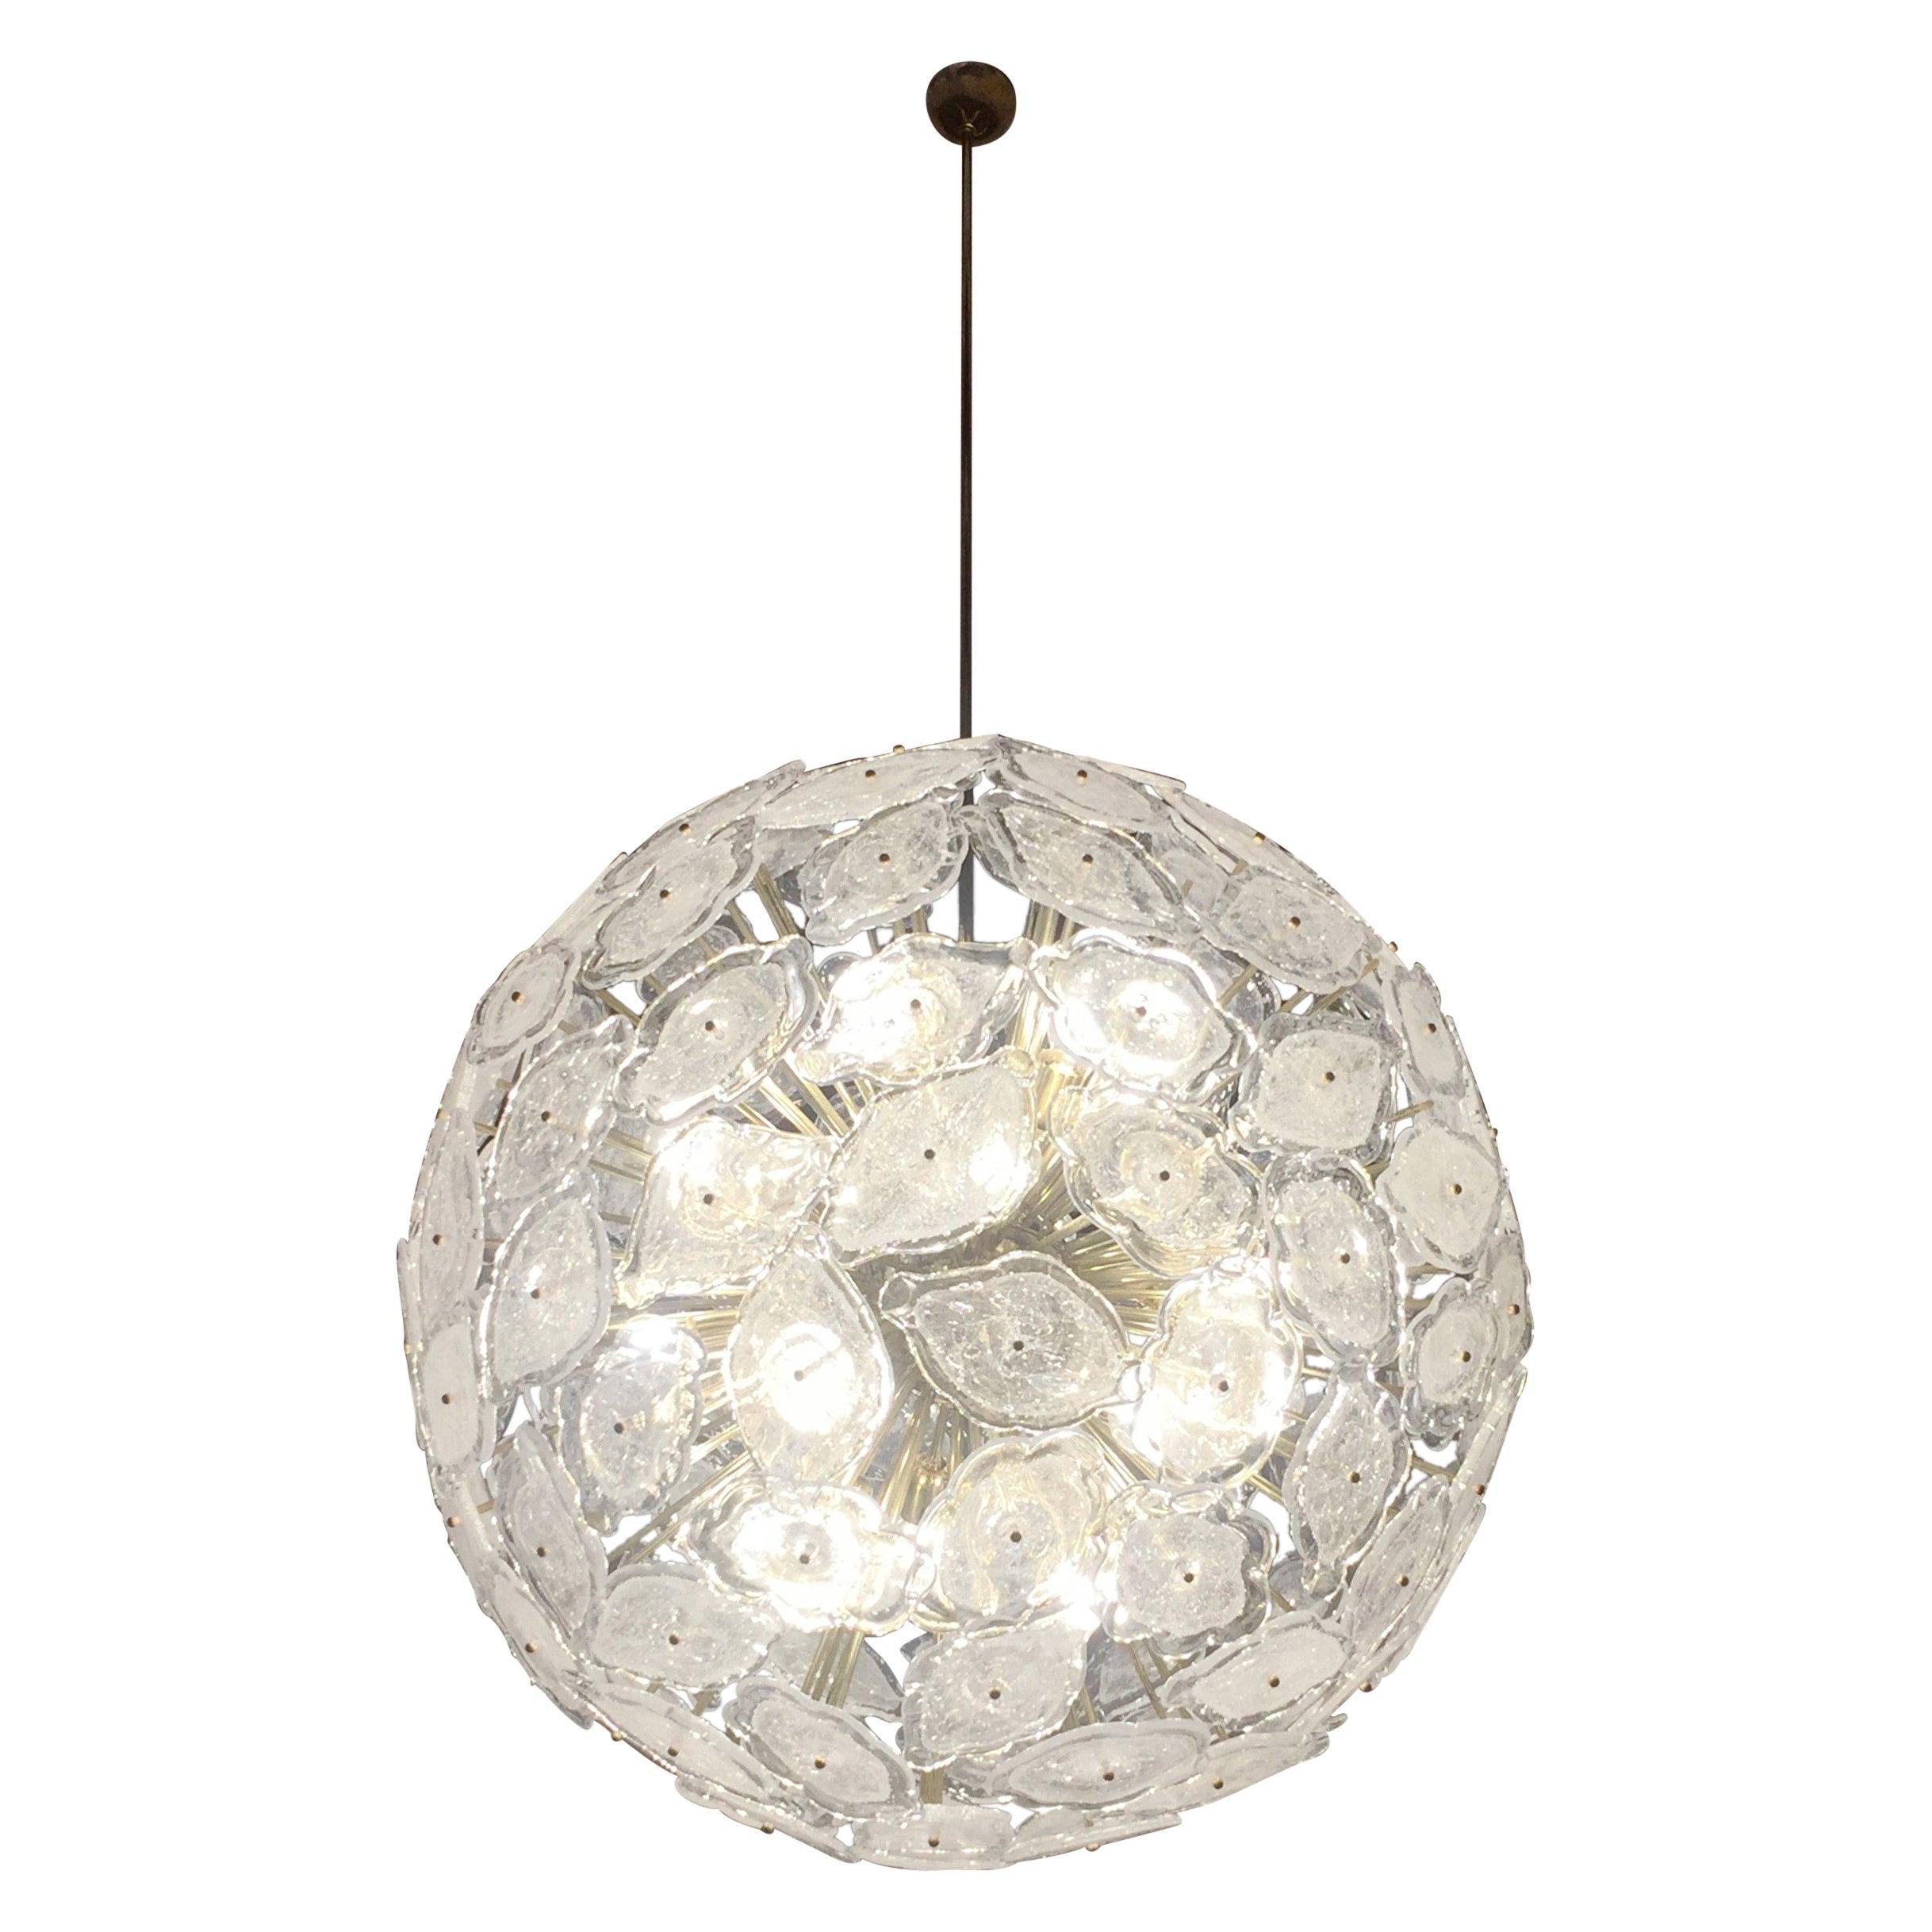 Contemporary Italian Brass & White Frosted Murano Glass Leaf Sputnik Chandelier